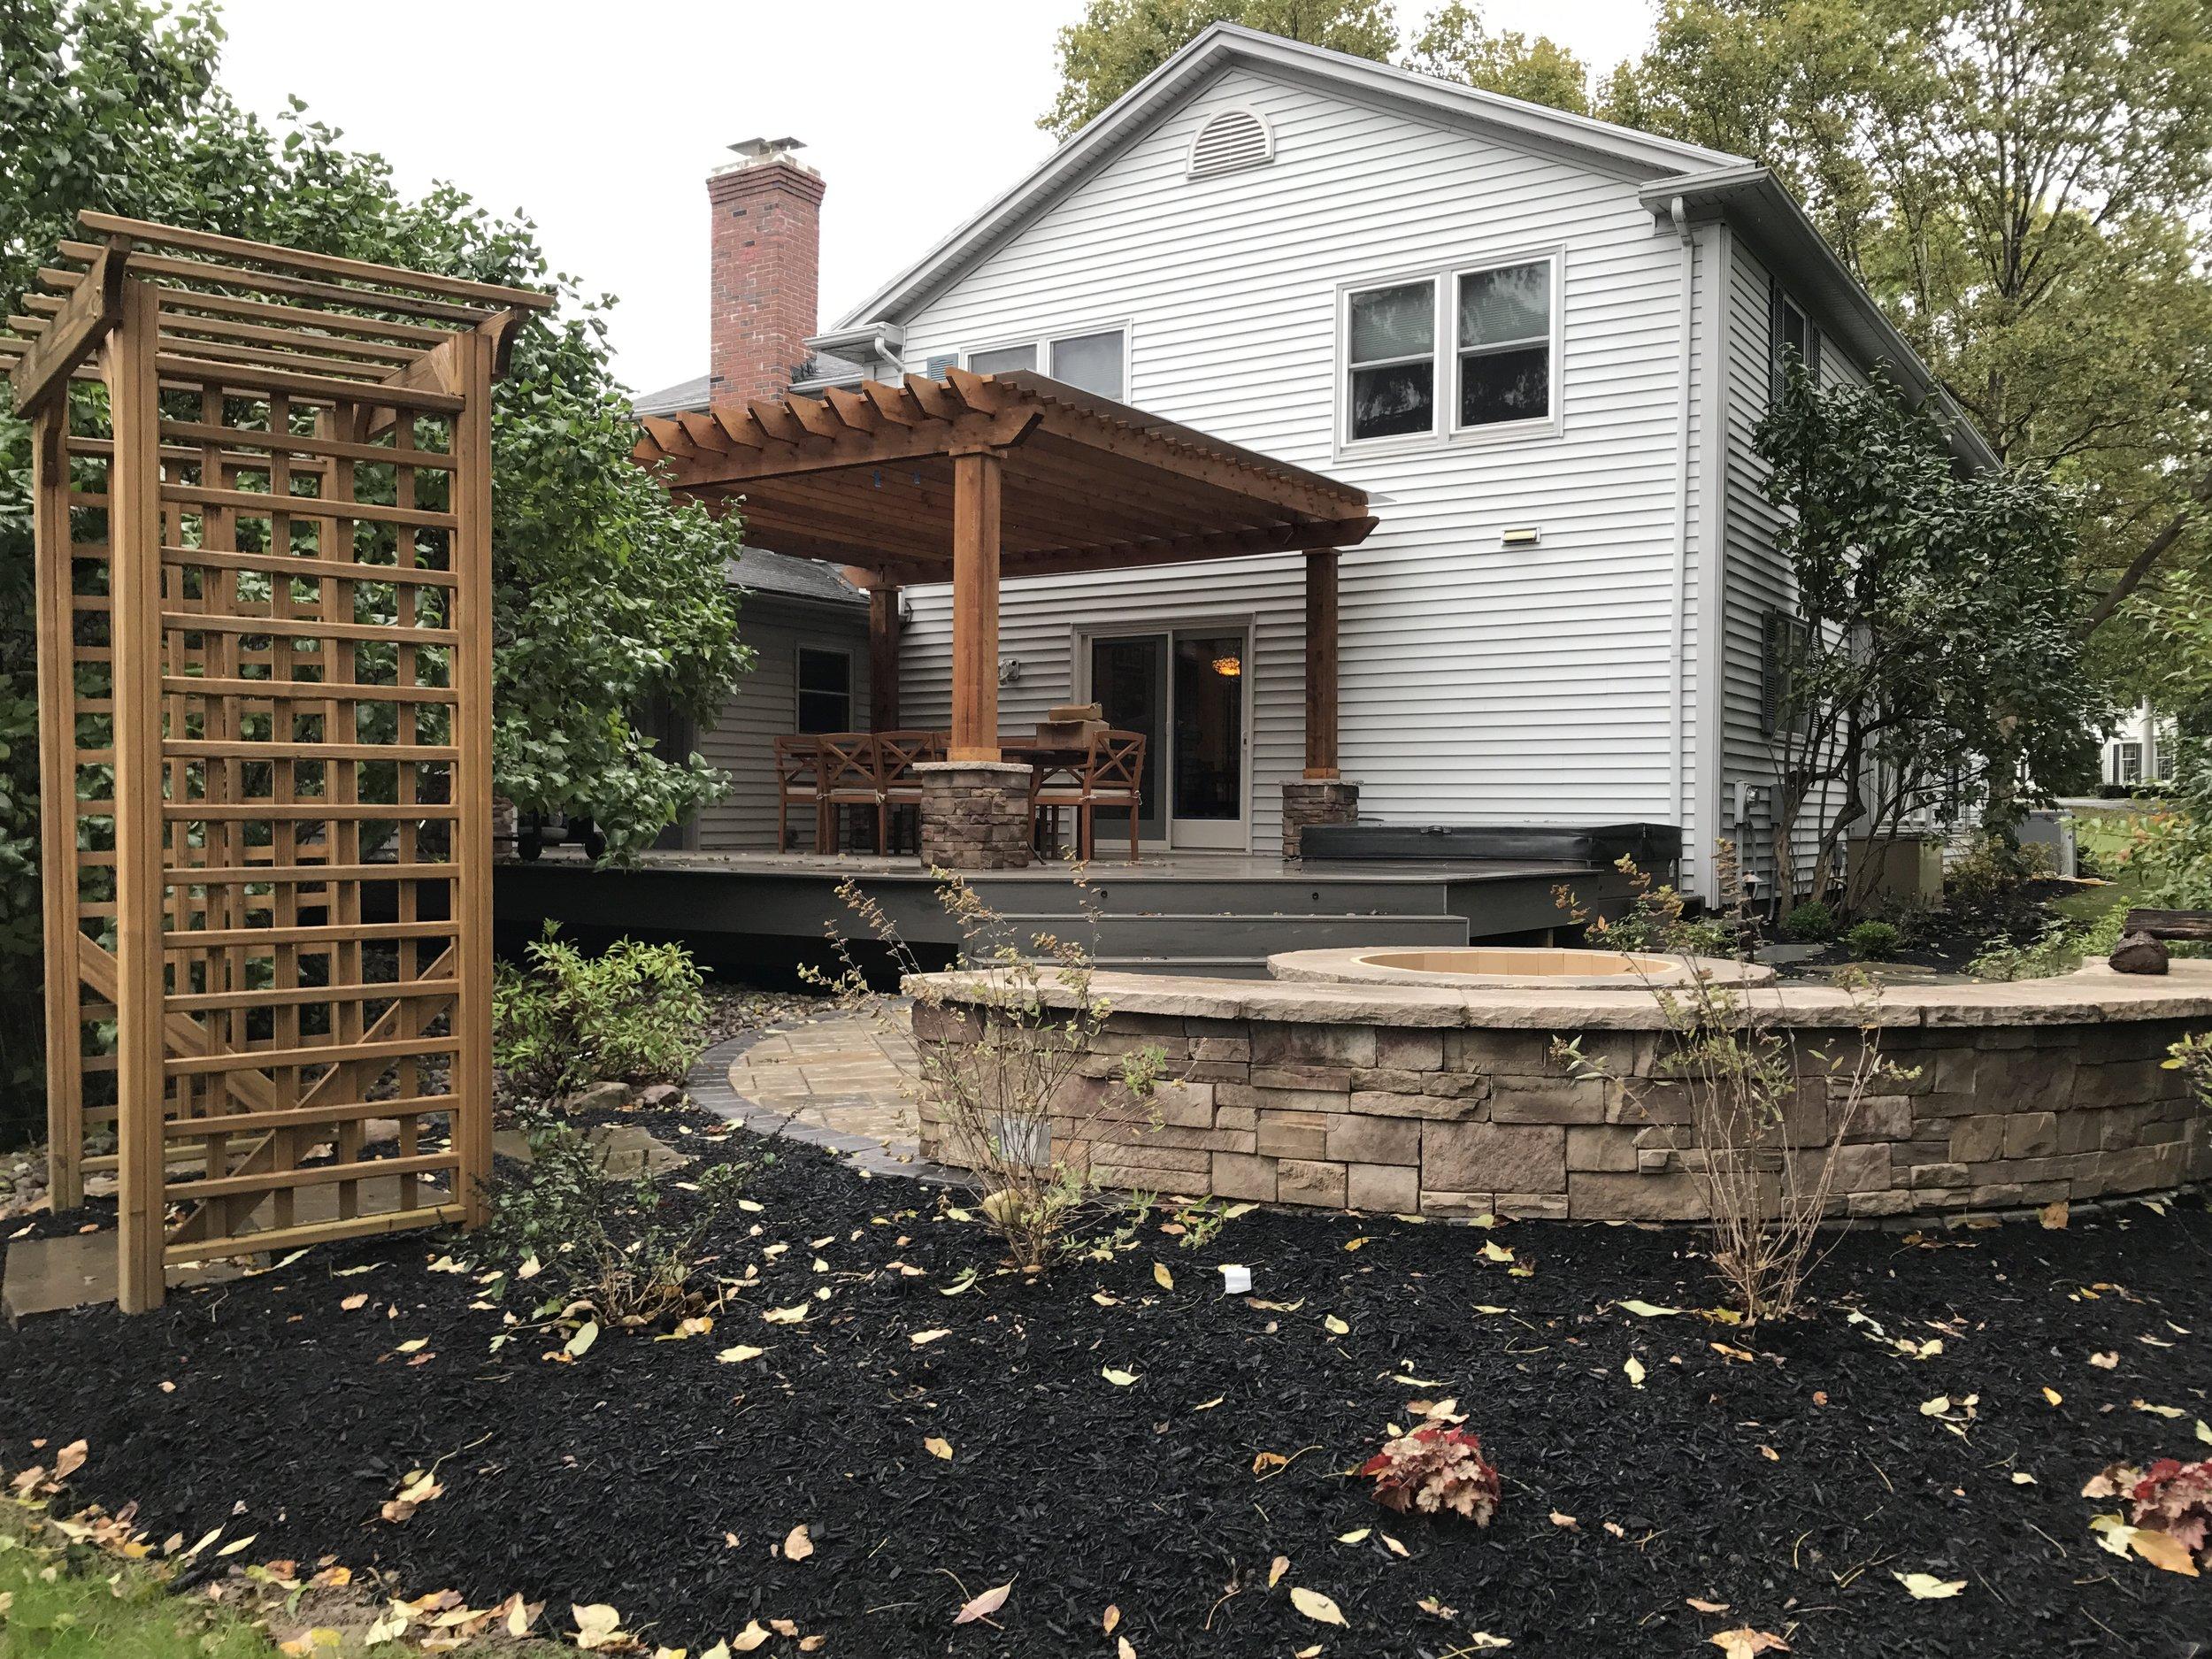 pergola sitting wall fire pit patio arbor trellis deck hot tub landscape design plantings